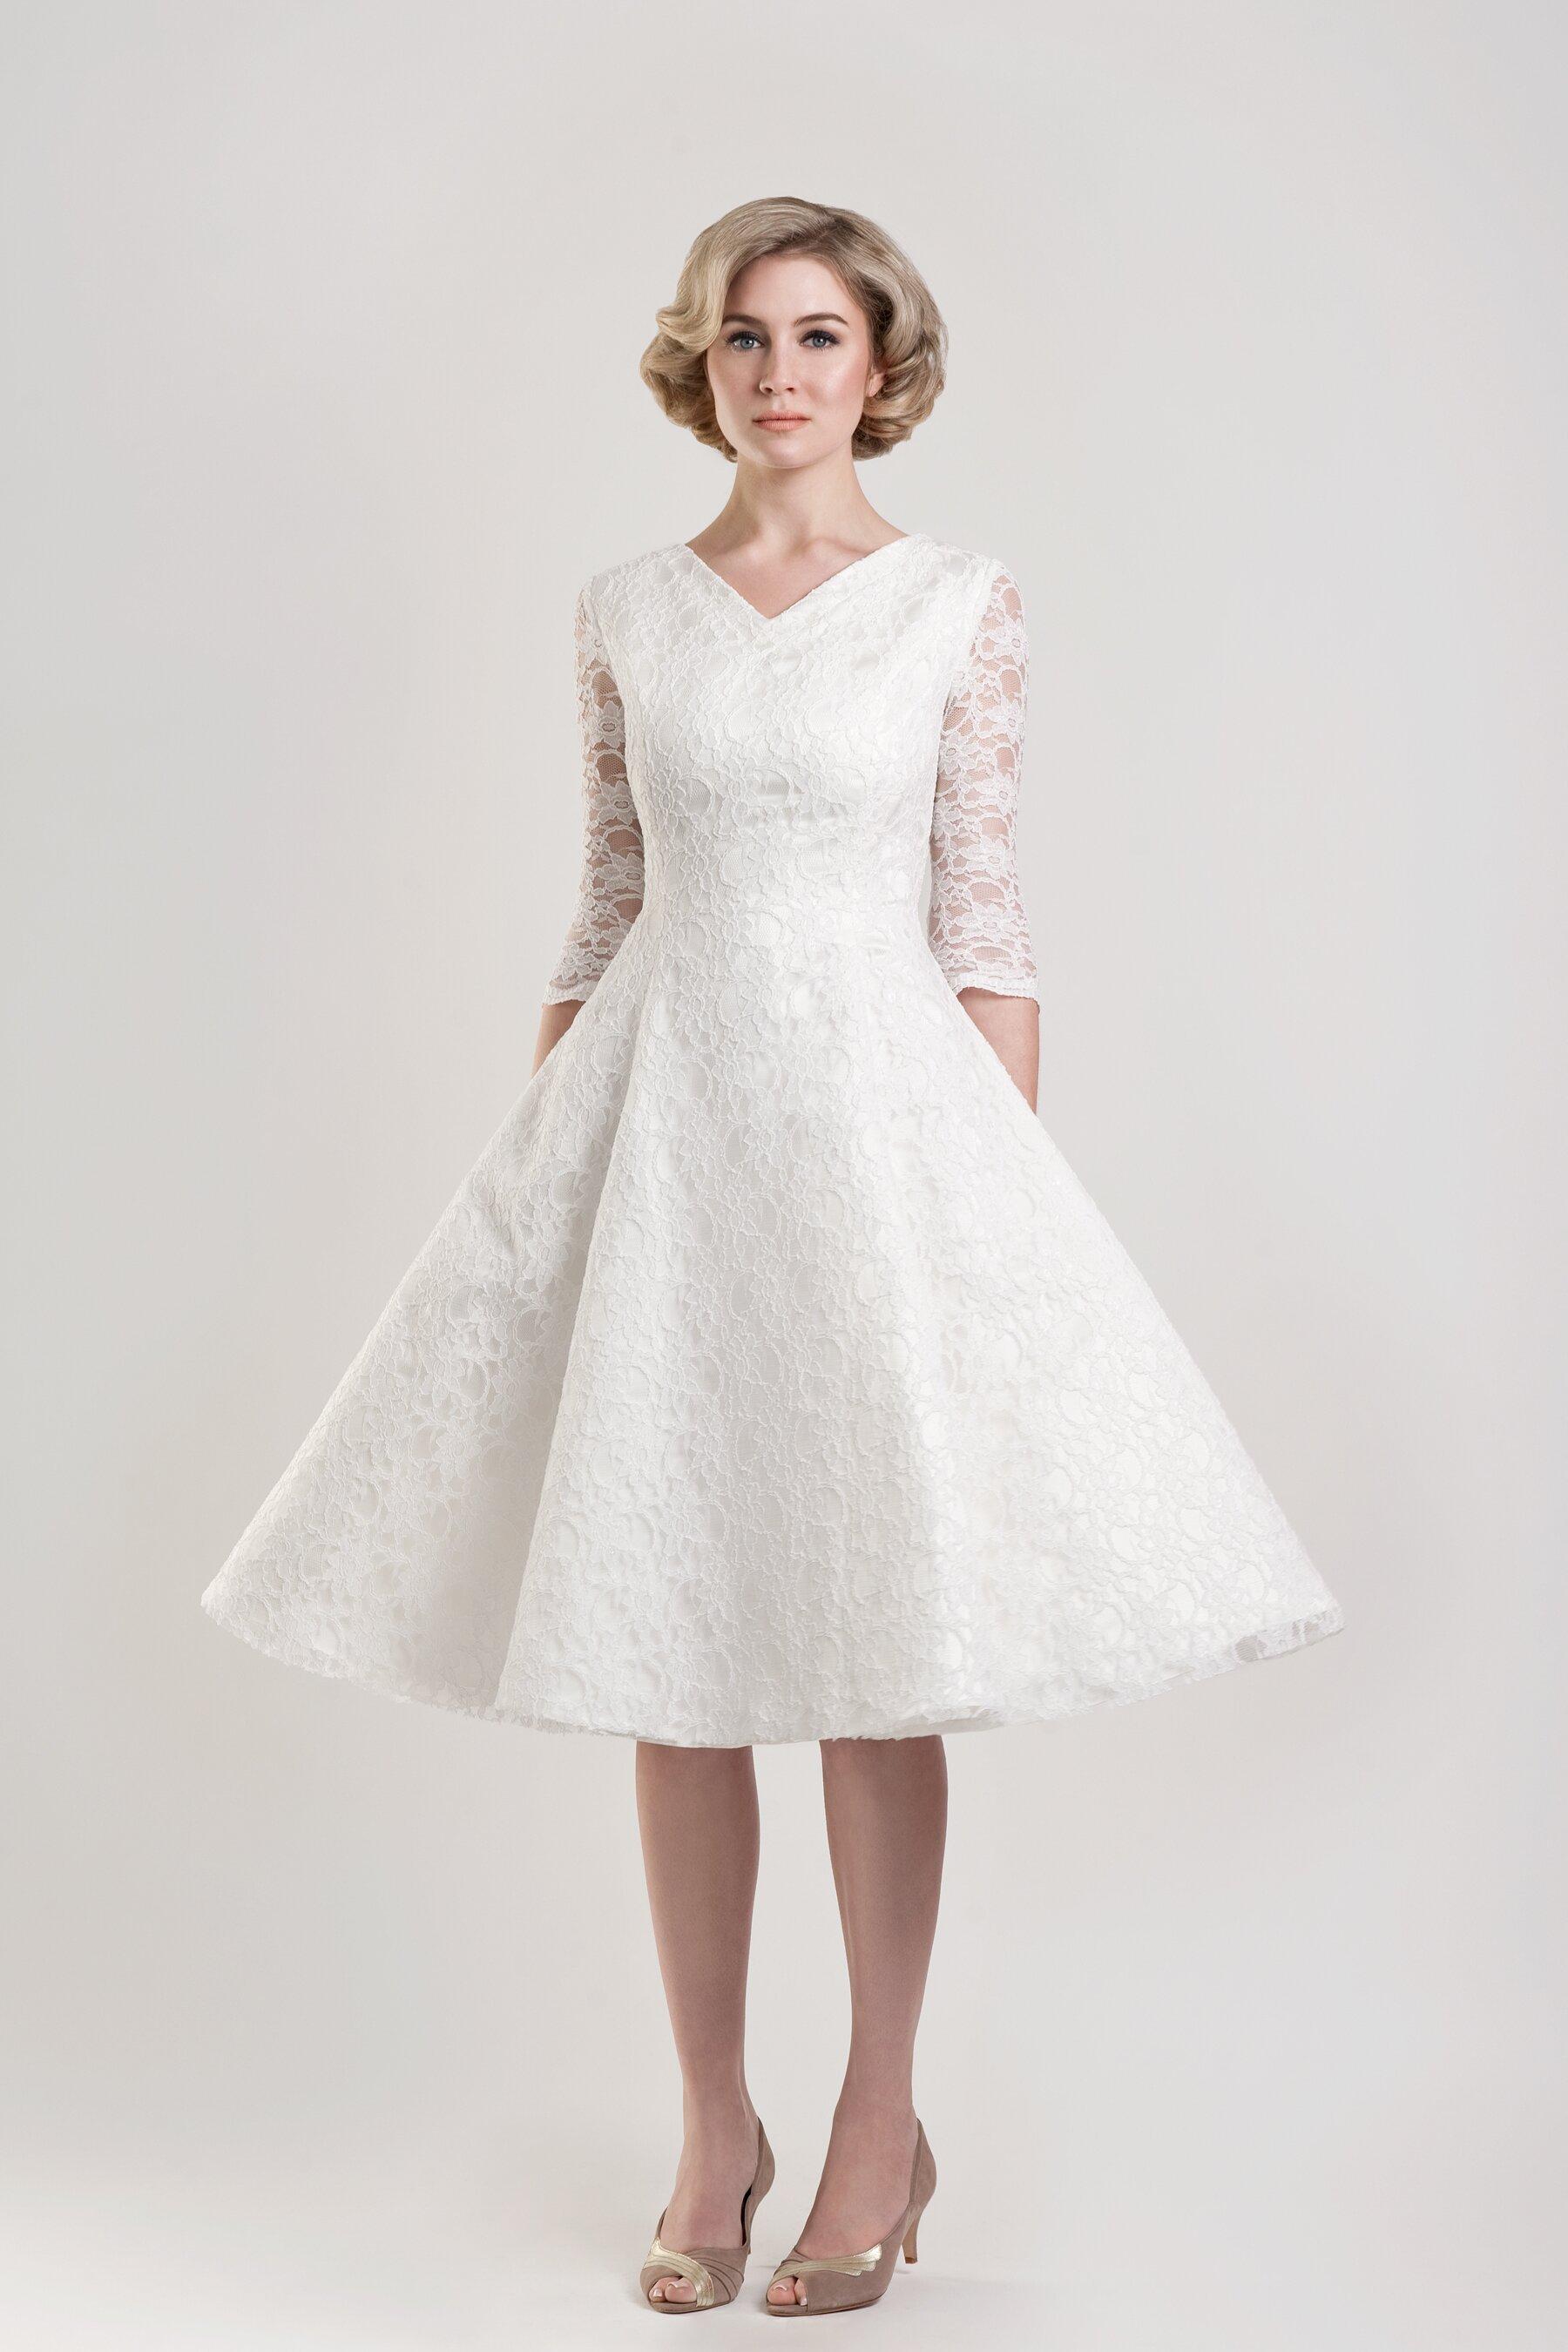 Vintage wedding party dresses Photo - 5